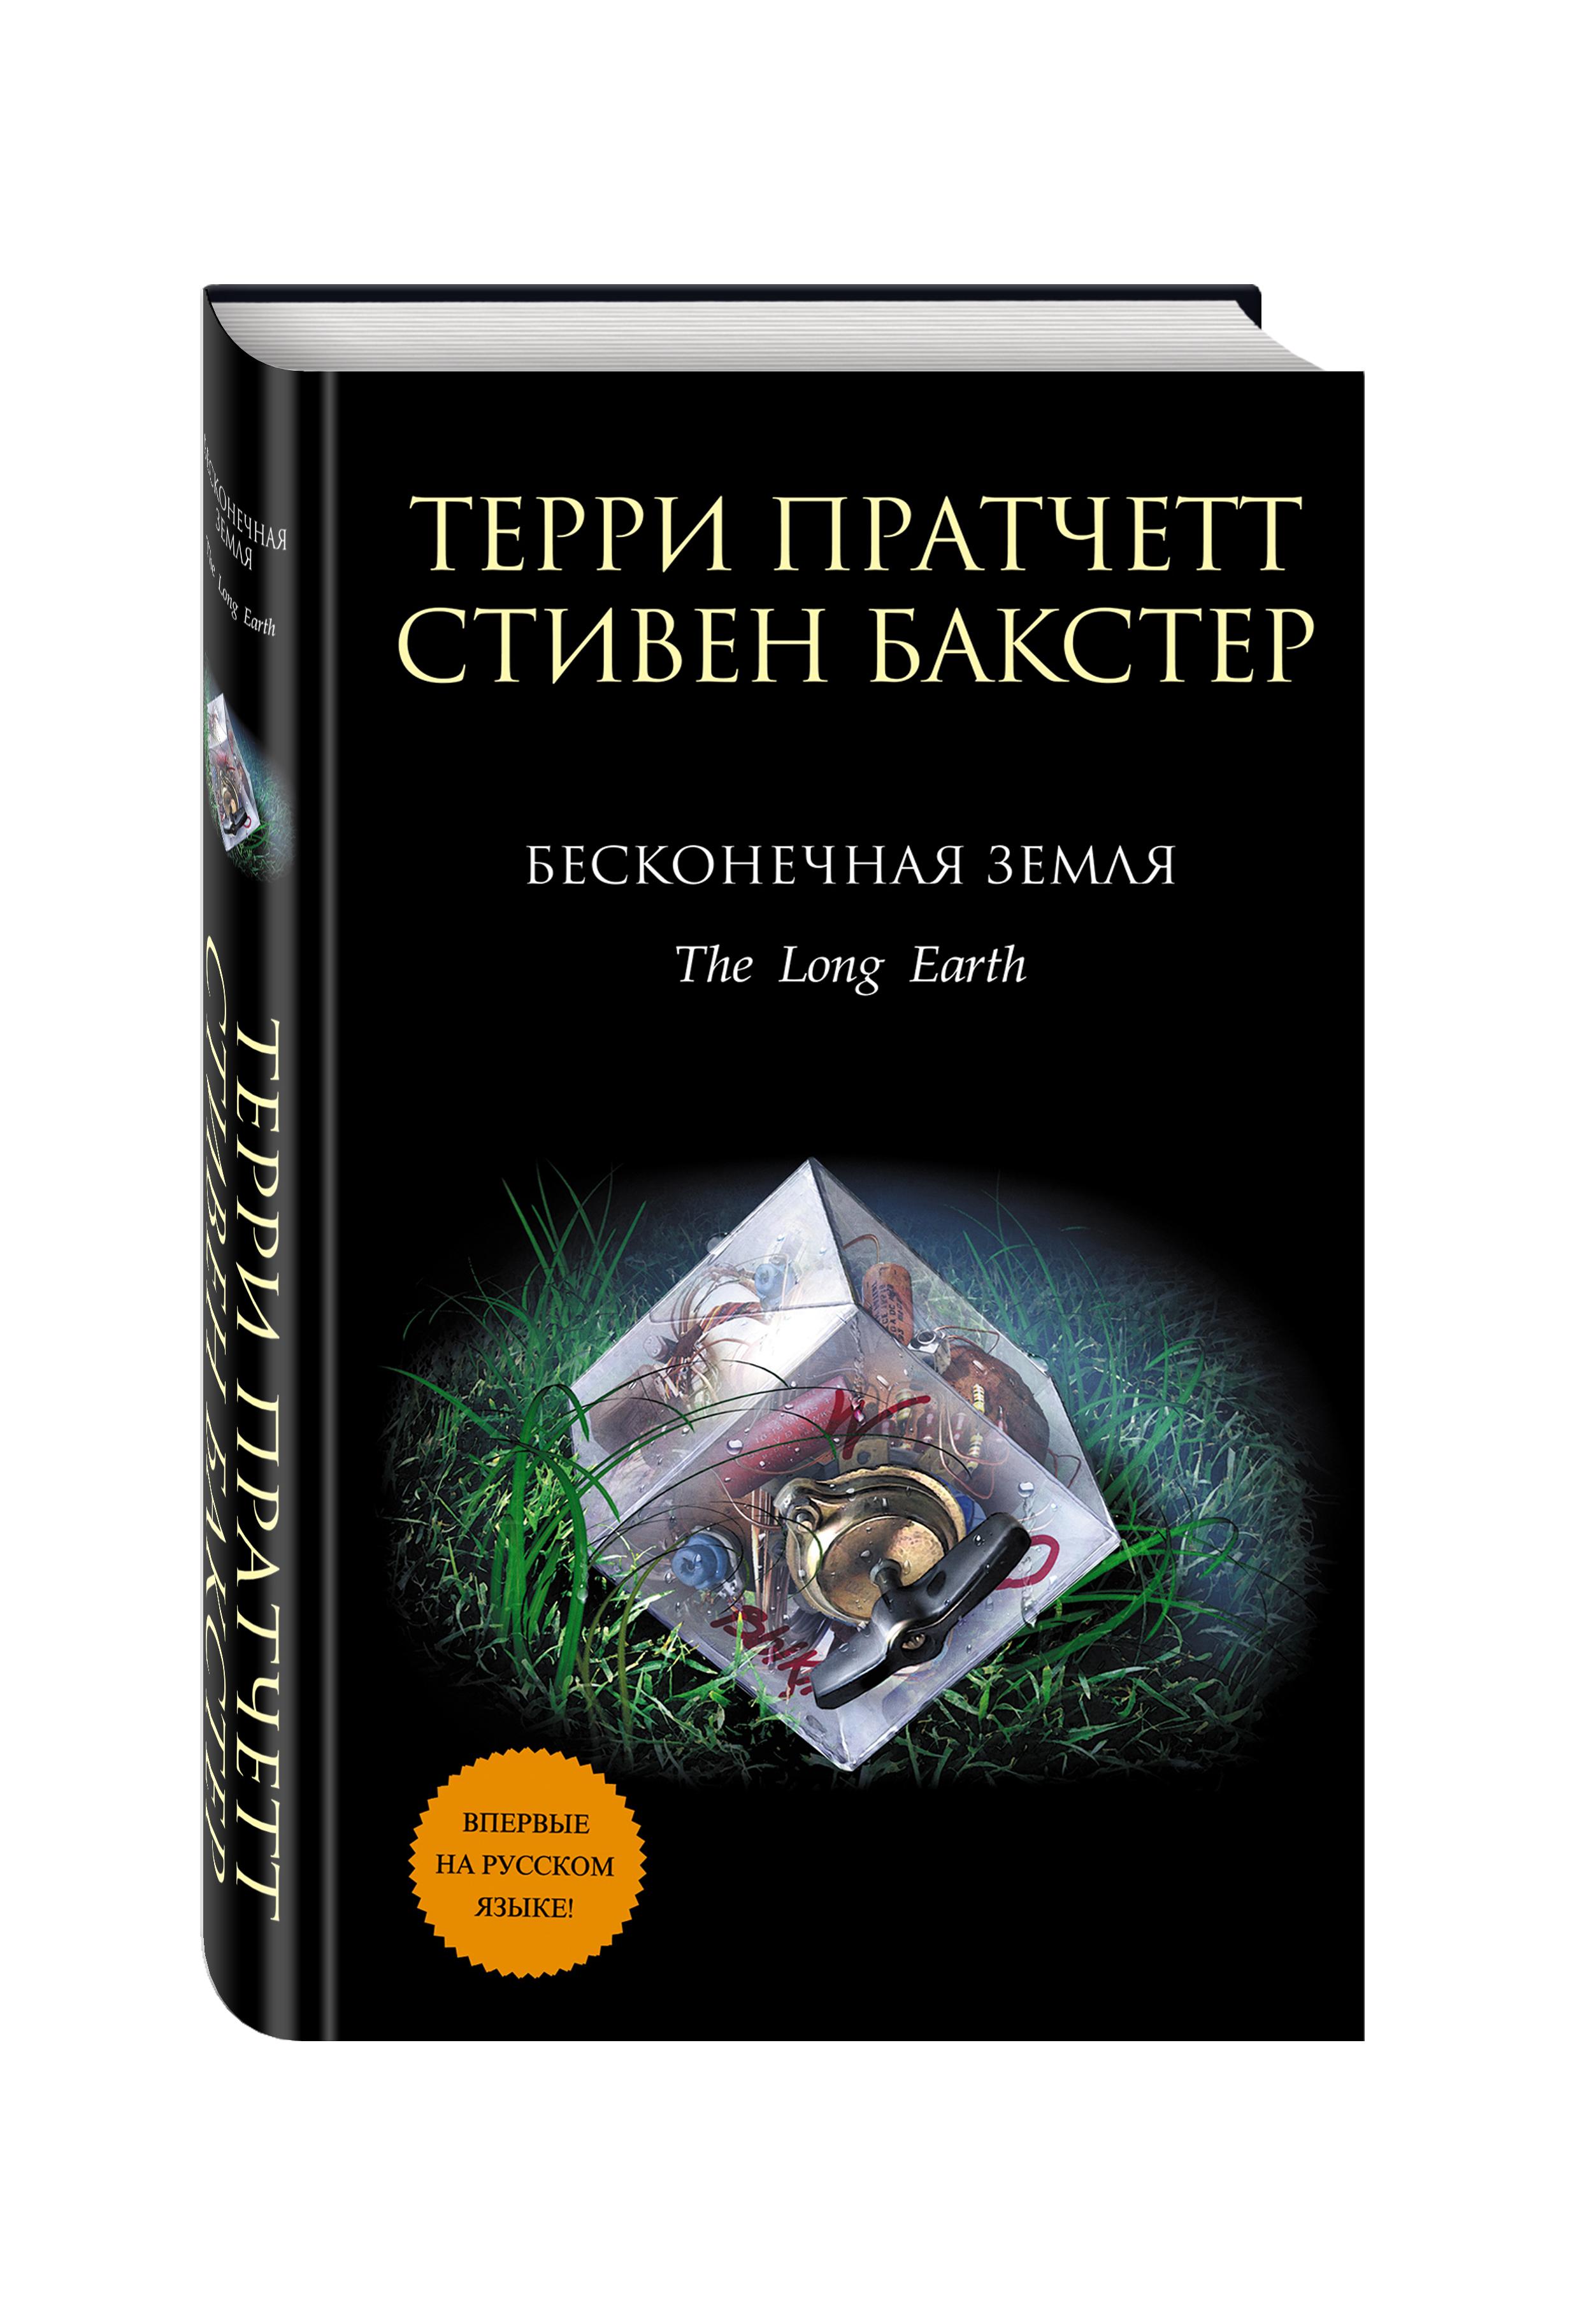 Терри Пратчетт, Стивен Бакстер Бесконечная Земля